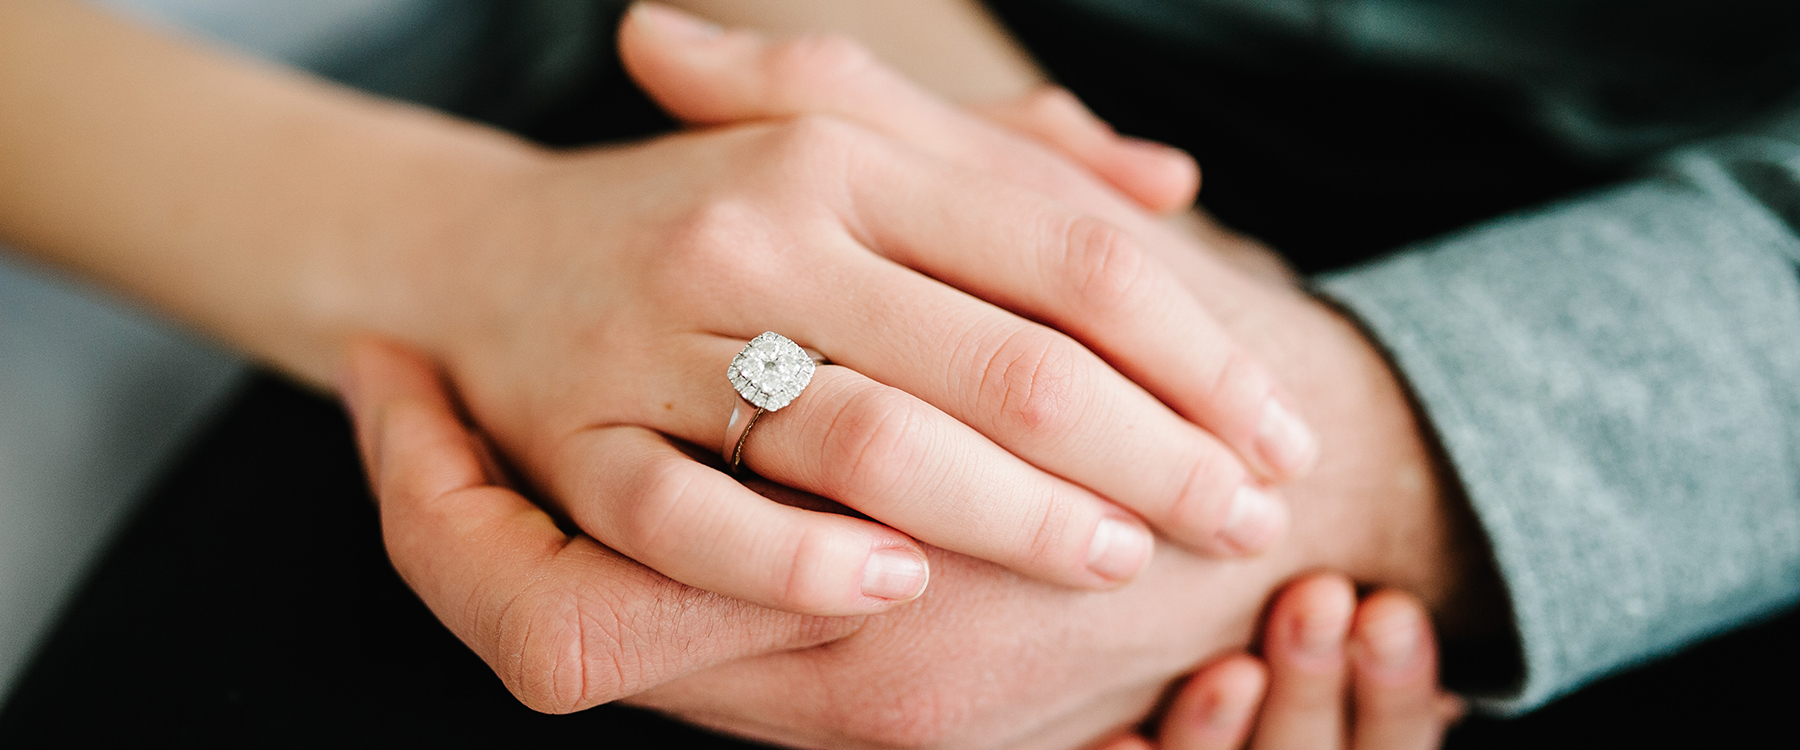 Bridal & Engagement  Trinity Diamonds Inc. Tucson, AZ